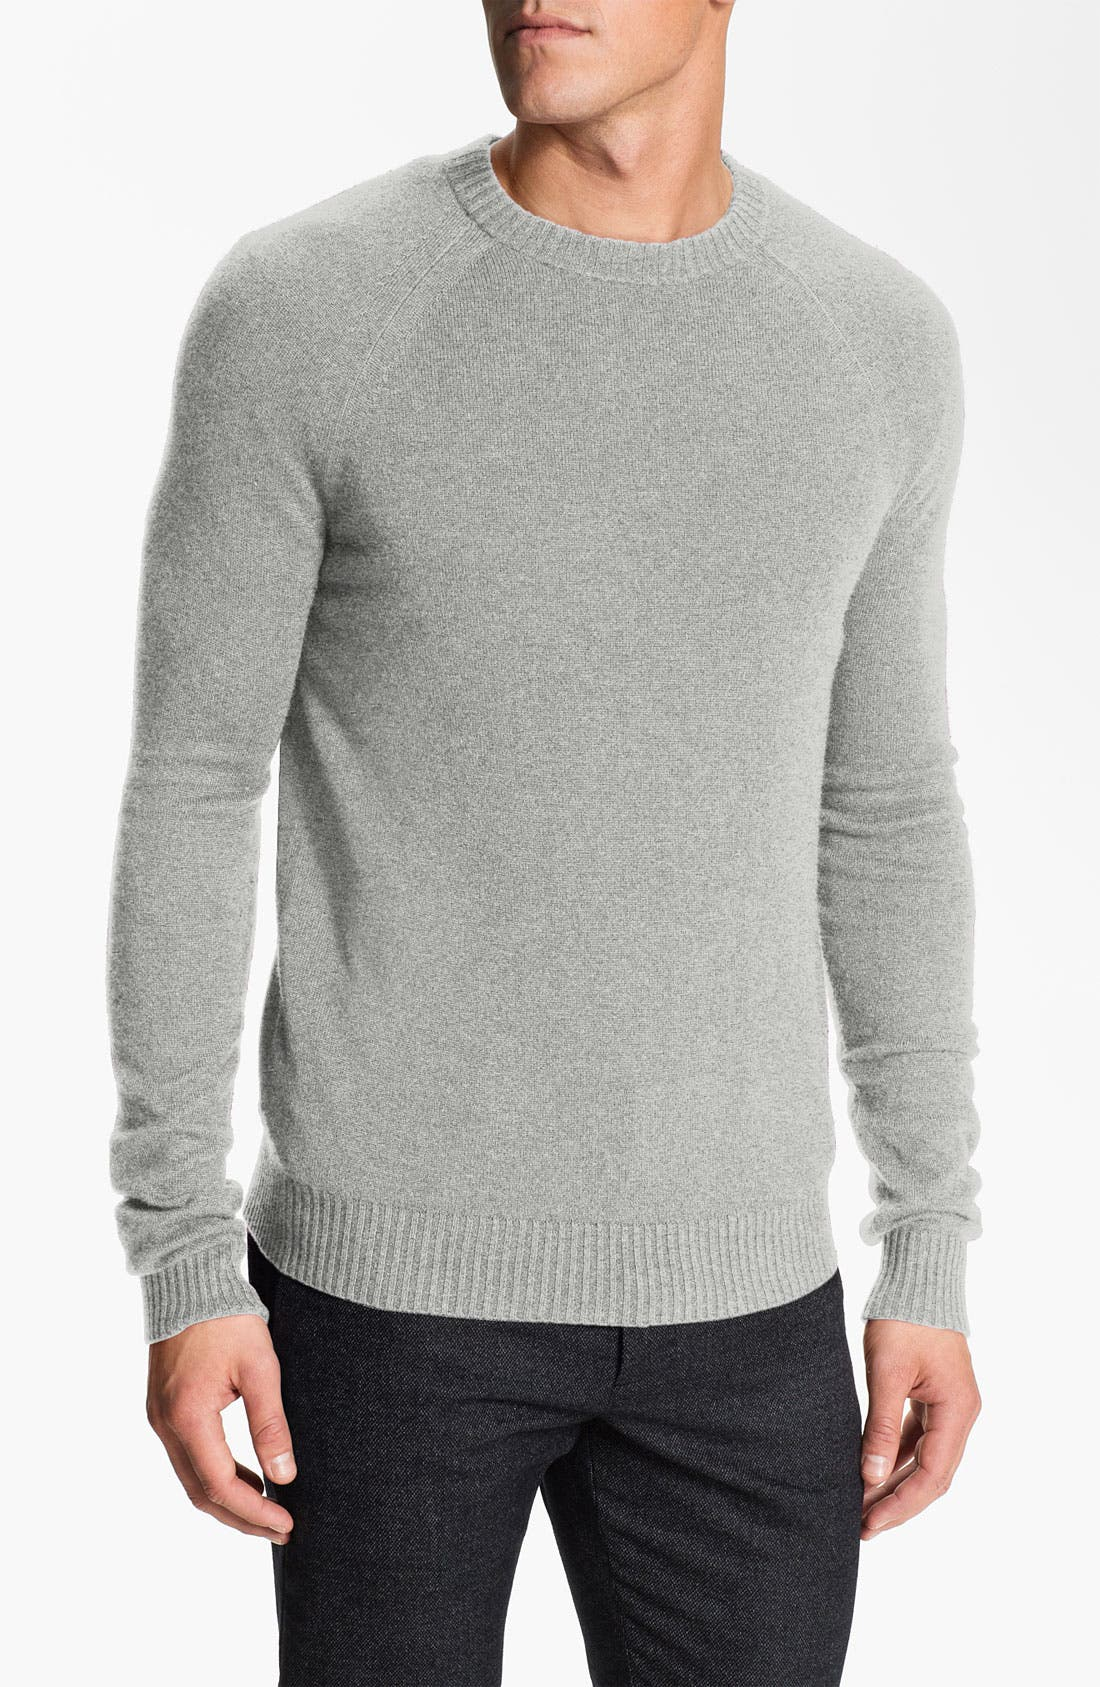 Alternate Image 1 Selected - Theory 'Lorenz' Cashmere Crewneck Sweater.